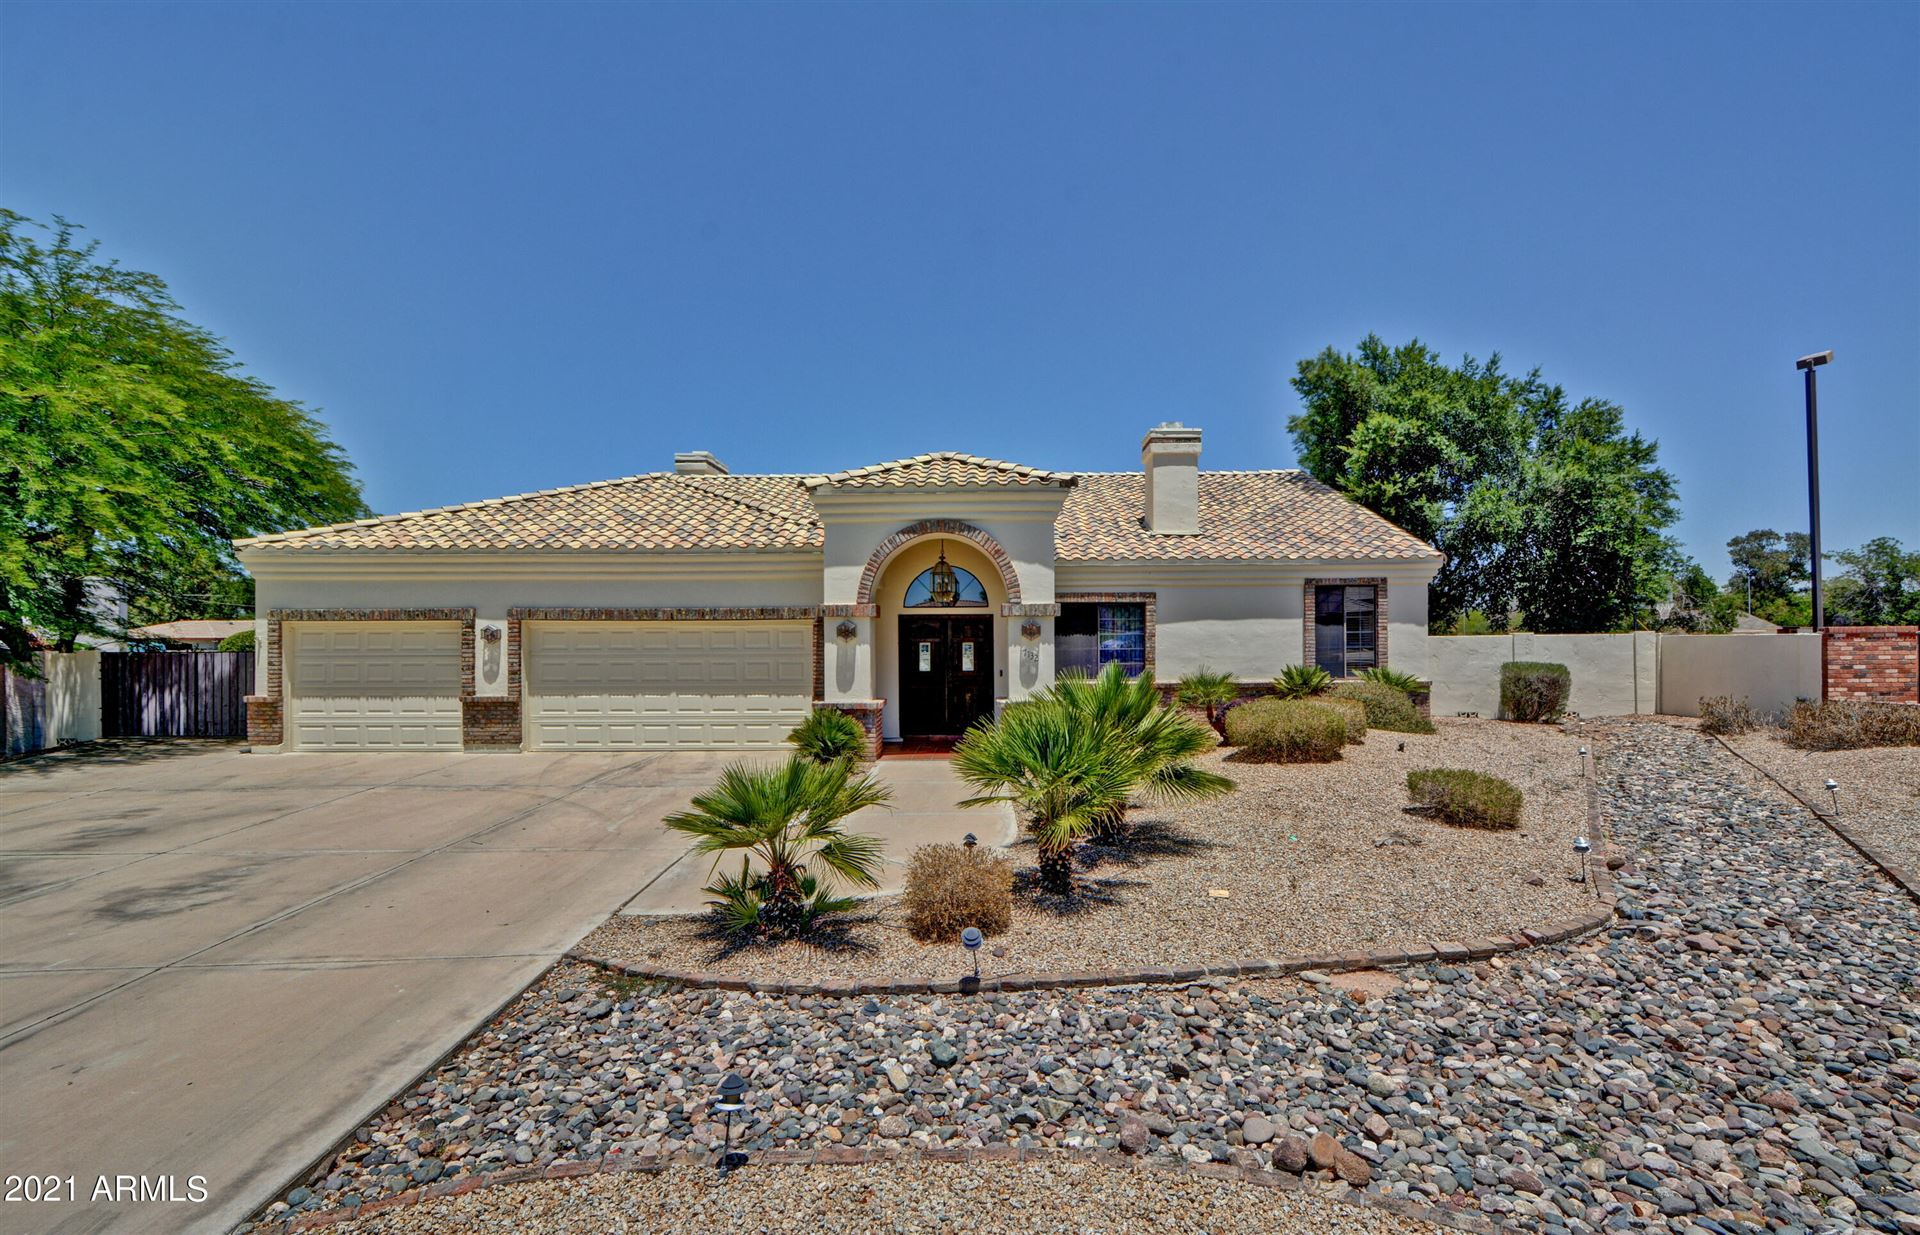 7132 W REDFIELD Road, Peoria, AZ 85381 - MLS#: 6245564